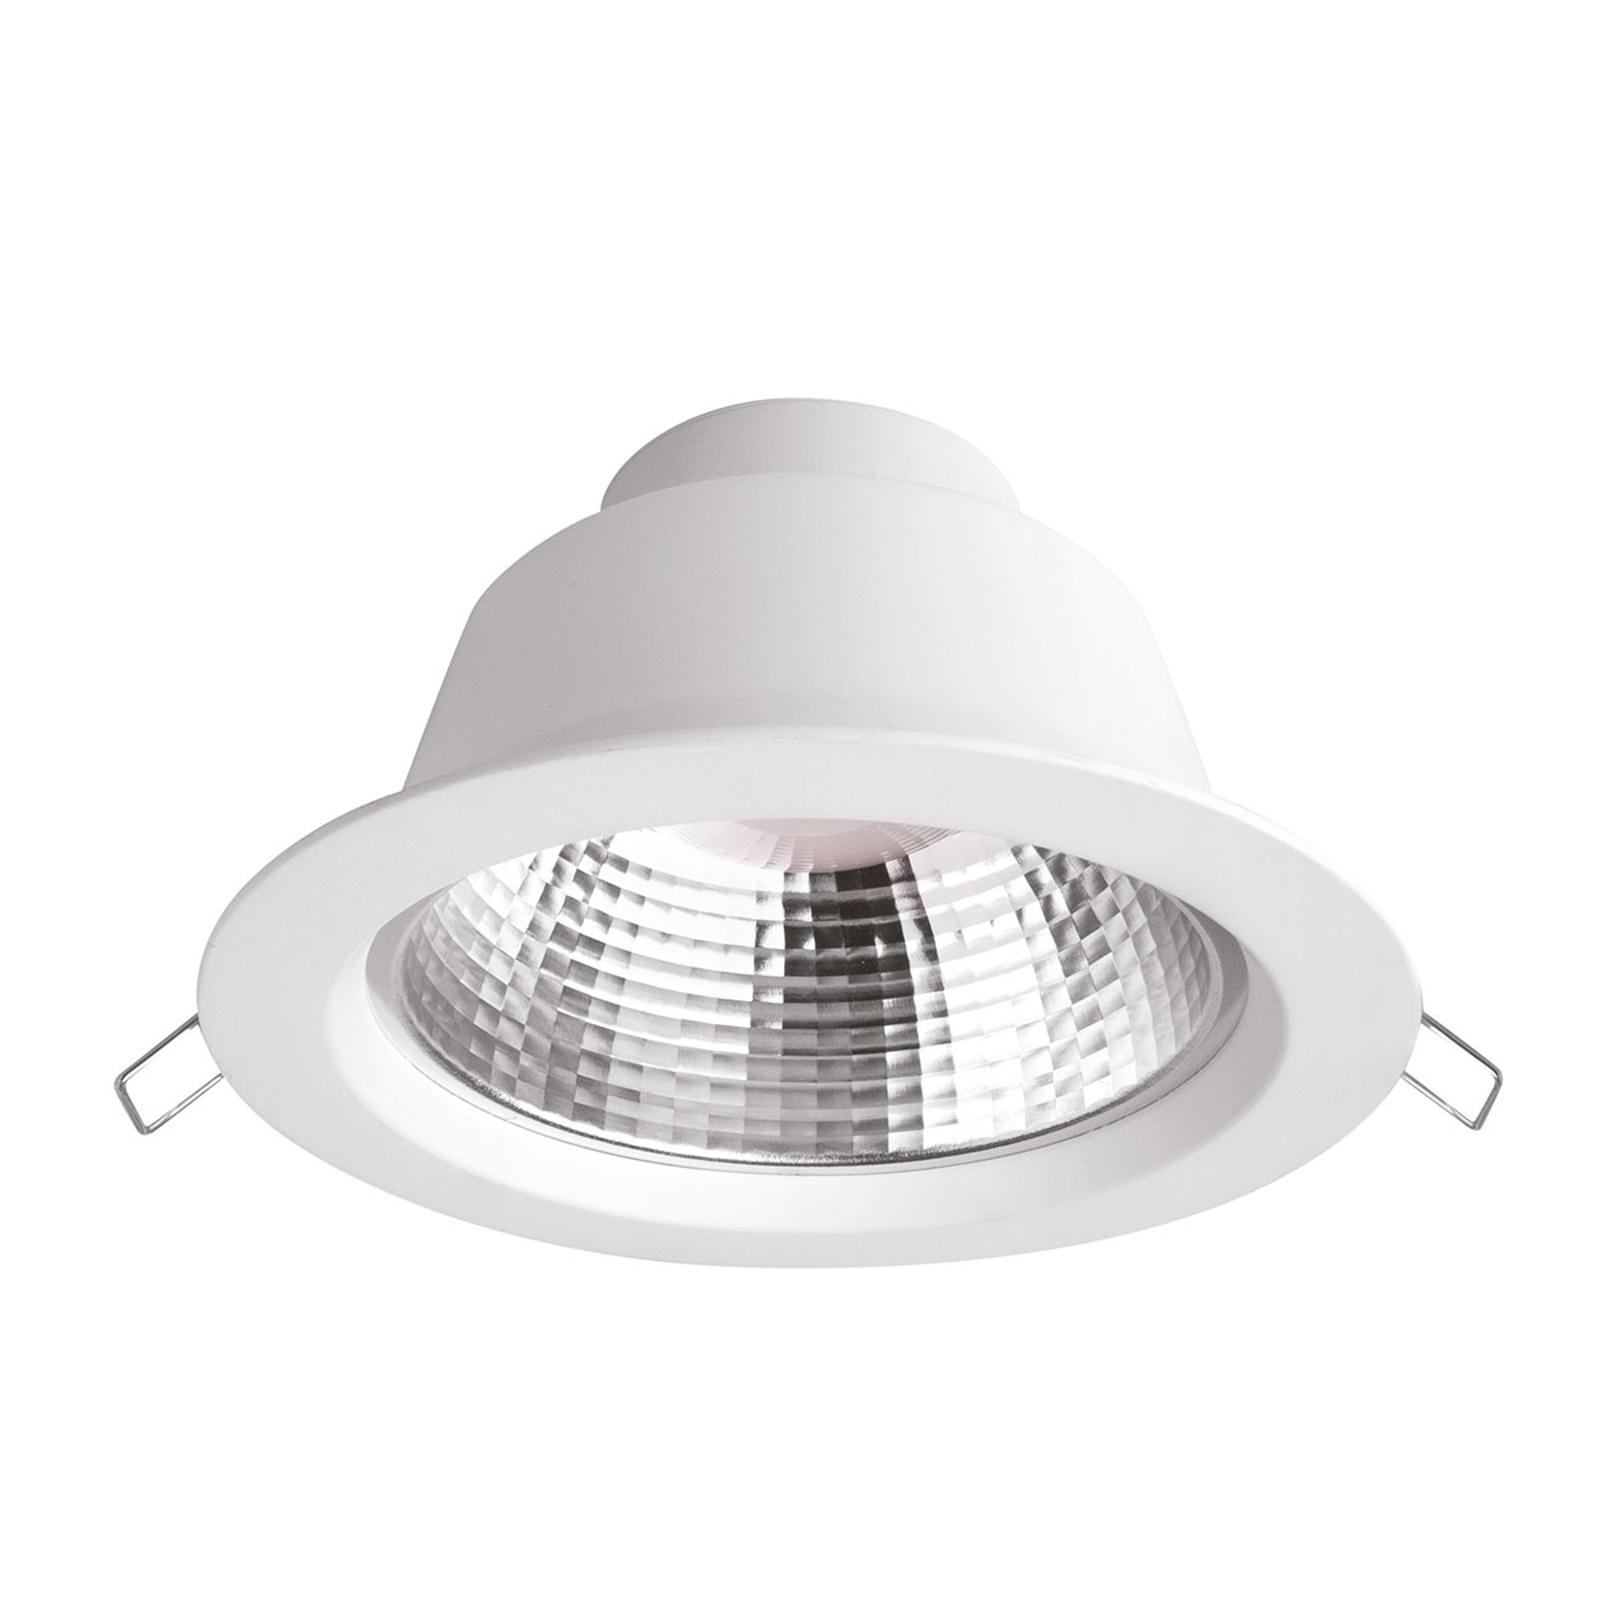 LED-Einbauleuchte Siena, 9,5 W, 4.000 K